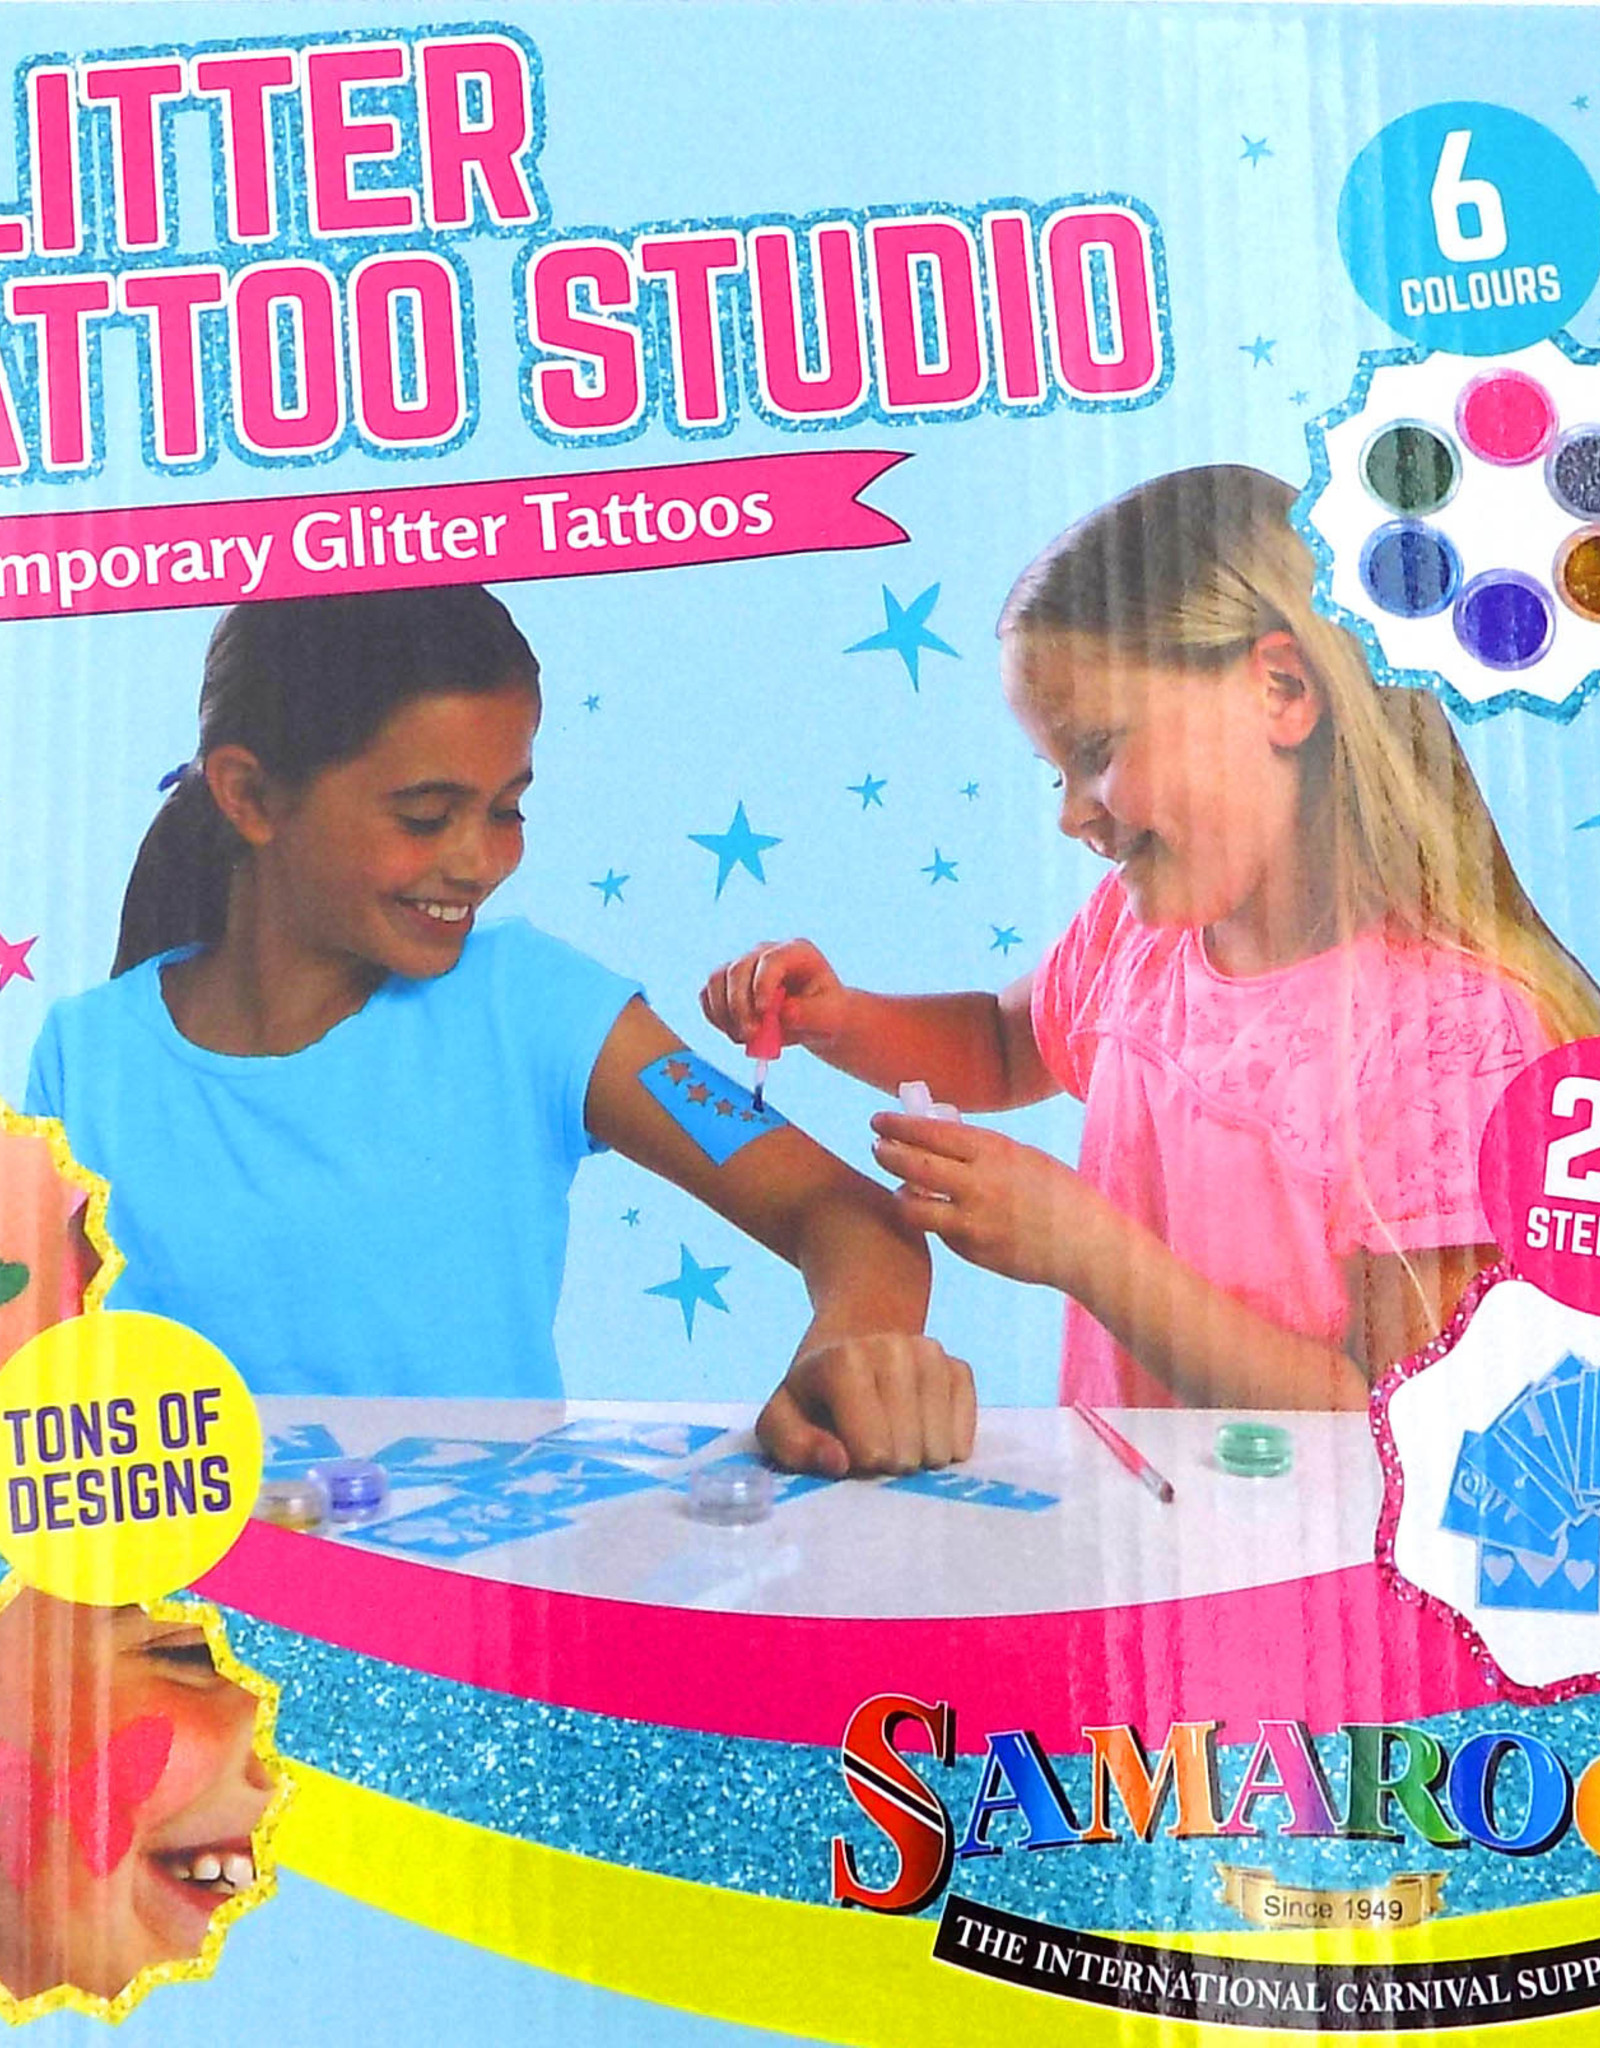 Temporary Glitter Tattoo Studio